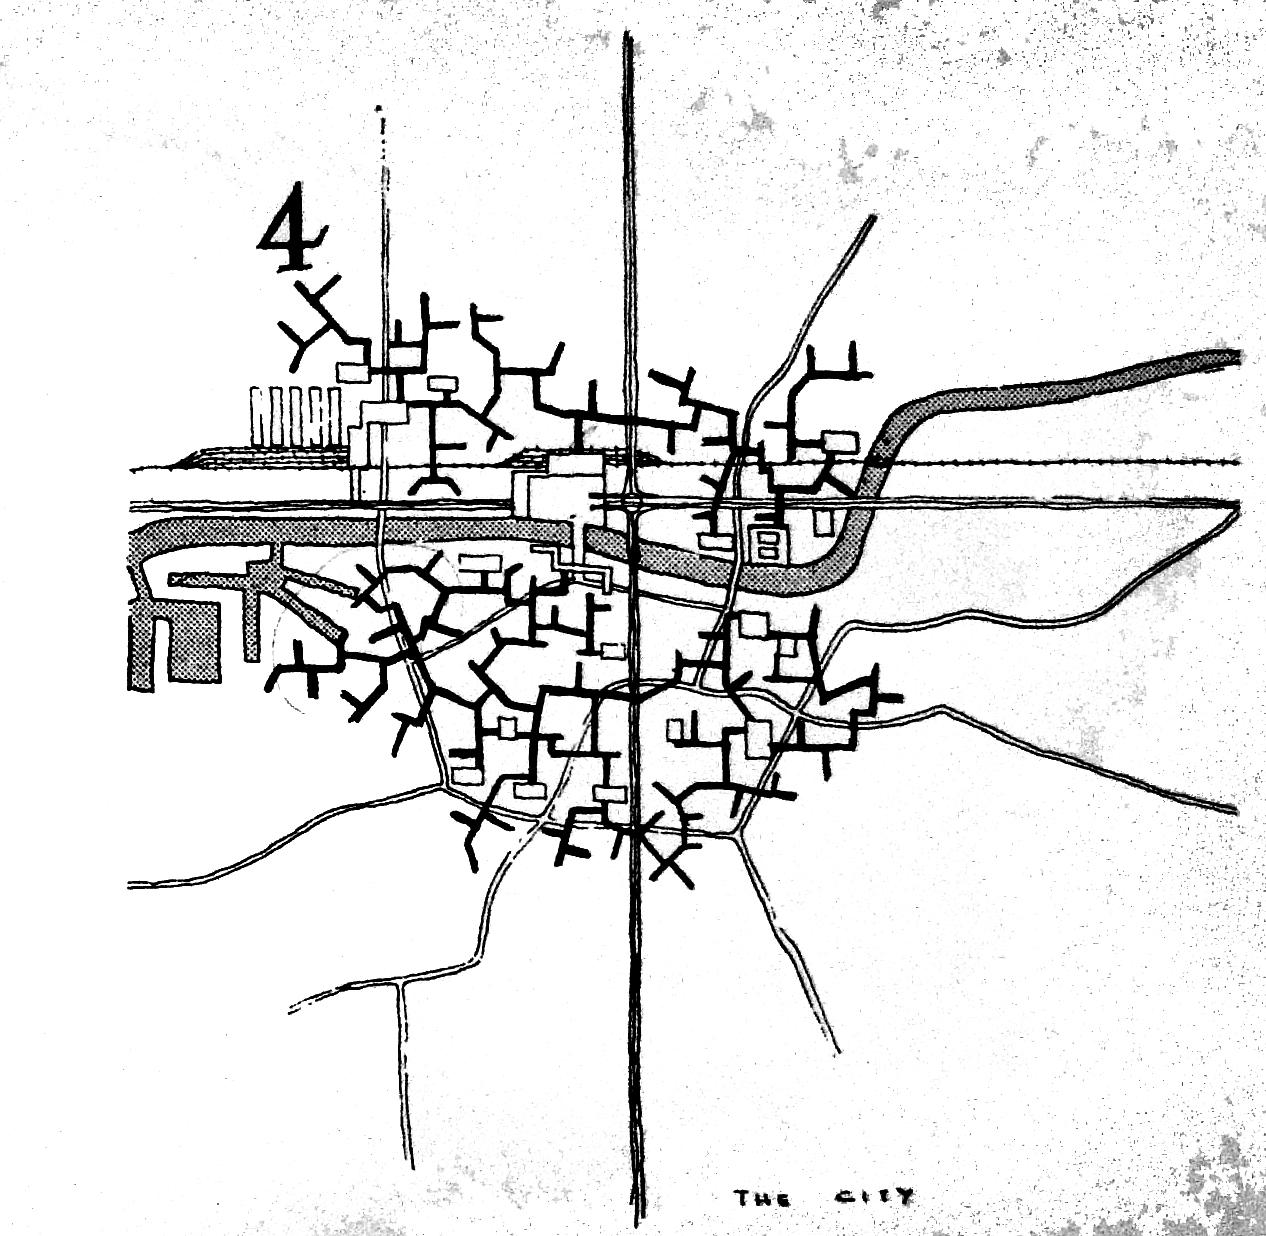 Golden lane housing 1952 londres alison y peter smithson for Team x architecture